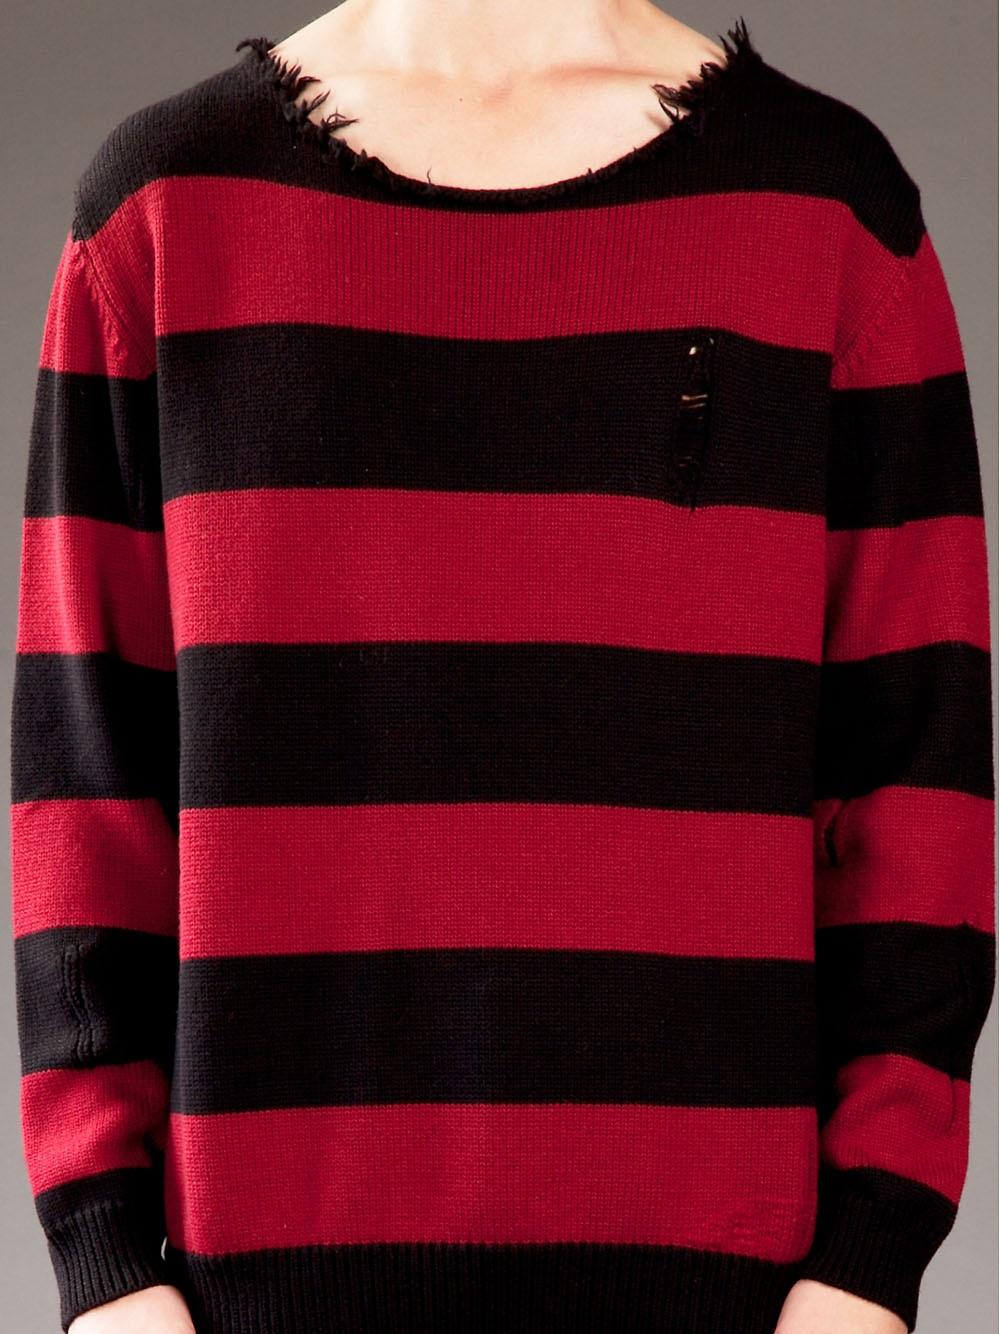 Dead Meat Striped Sweater In Red For Men Lyst